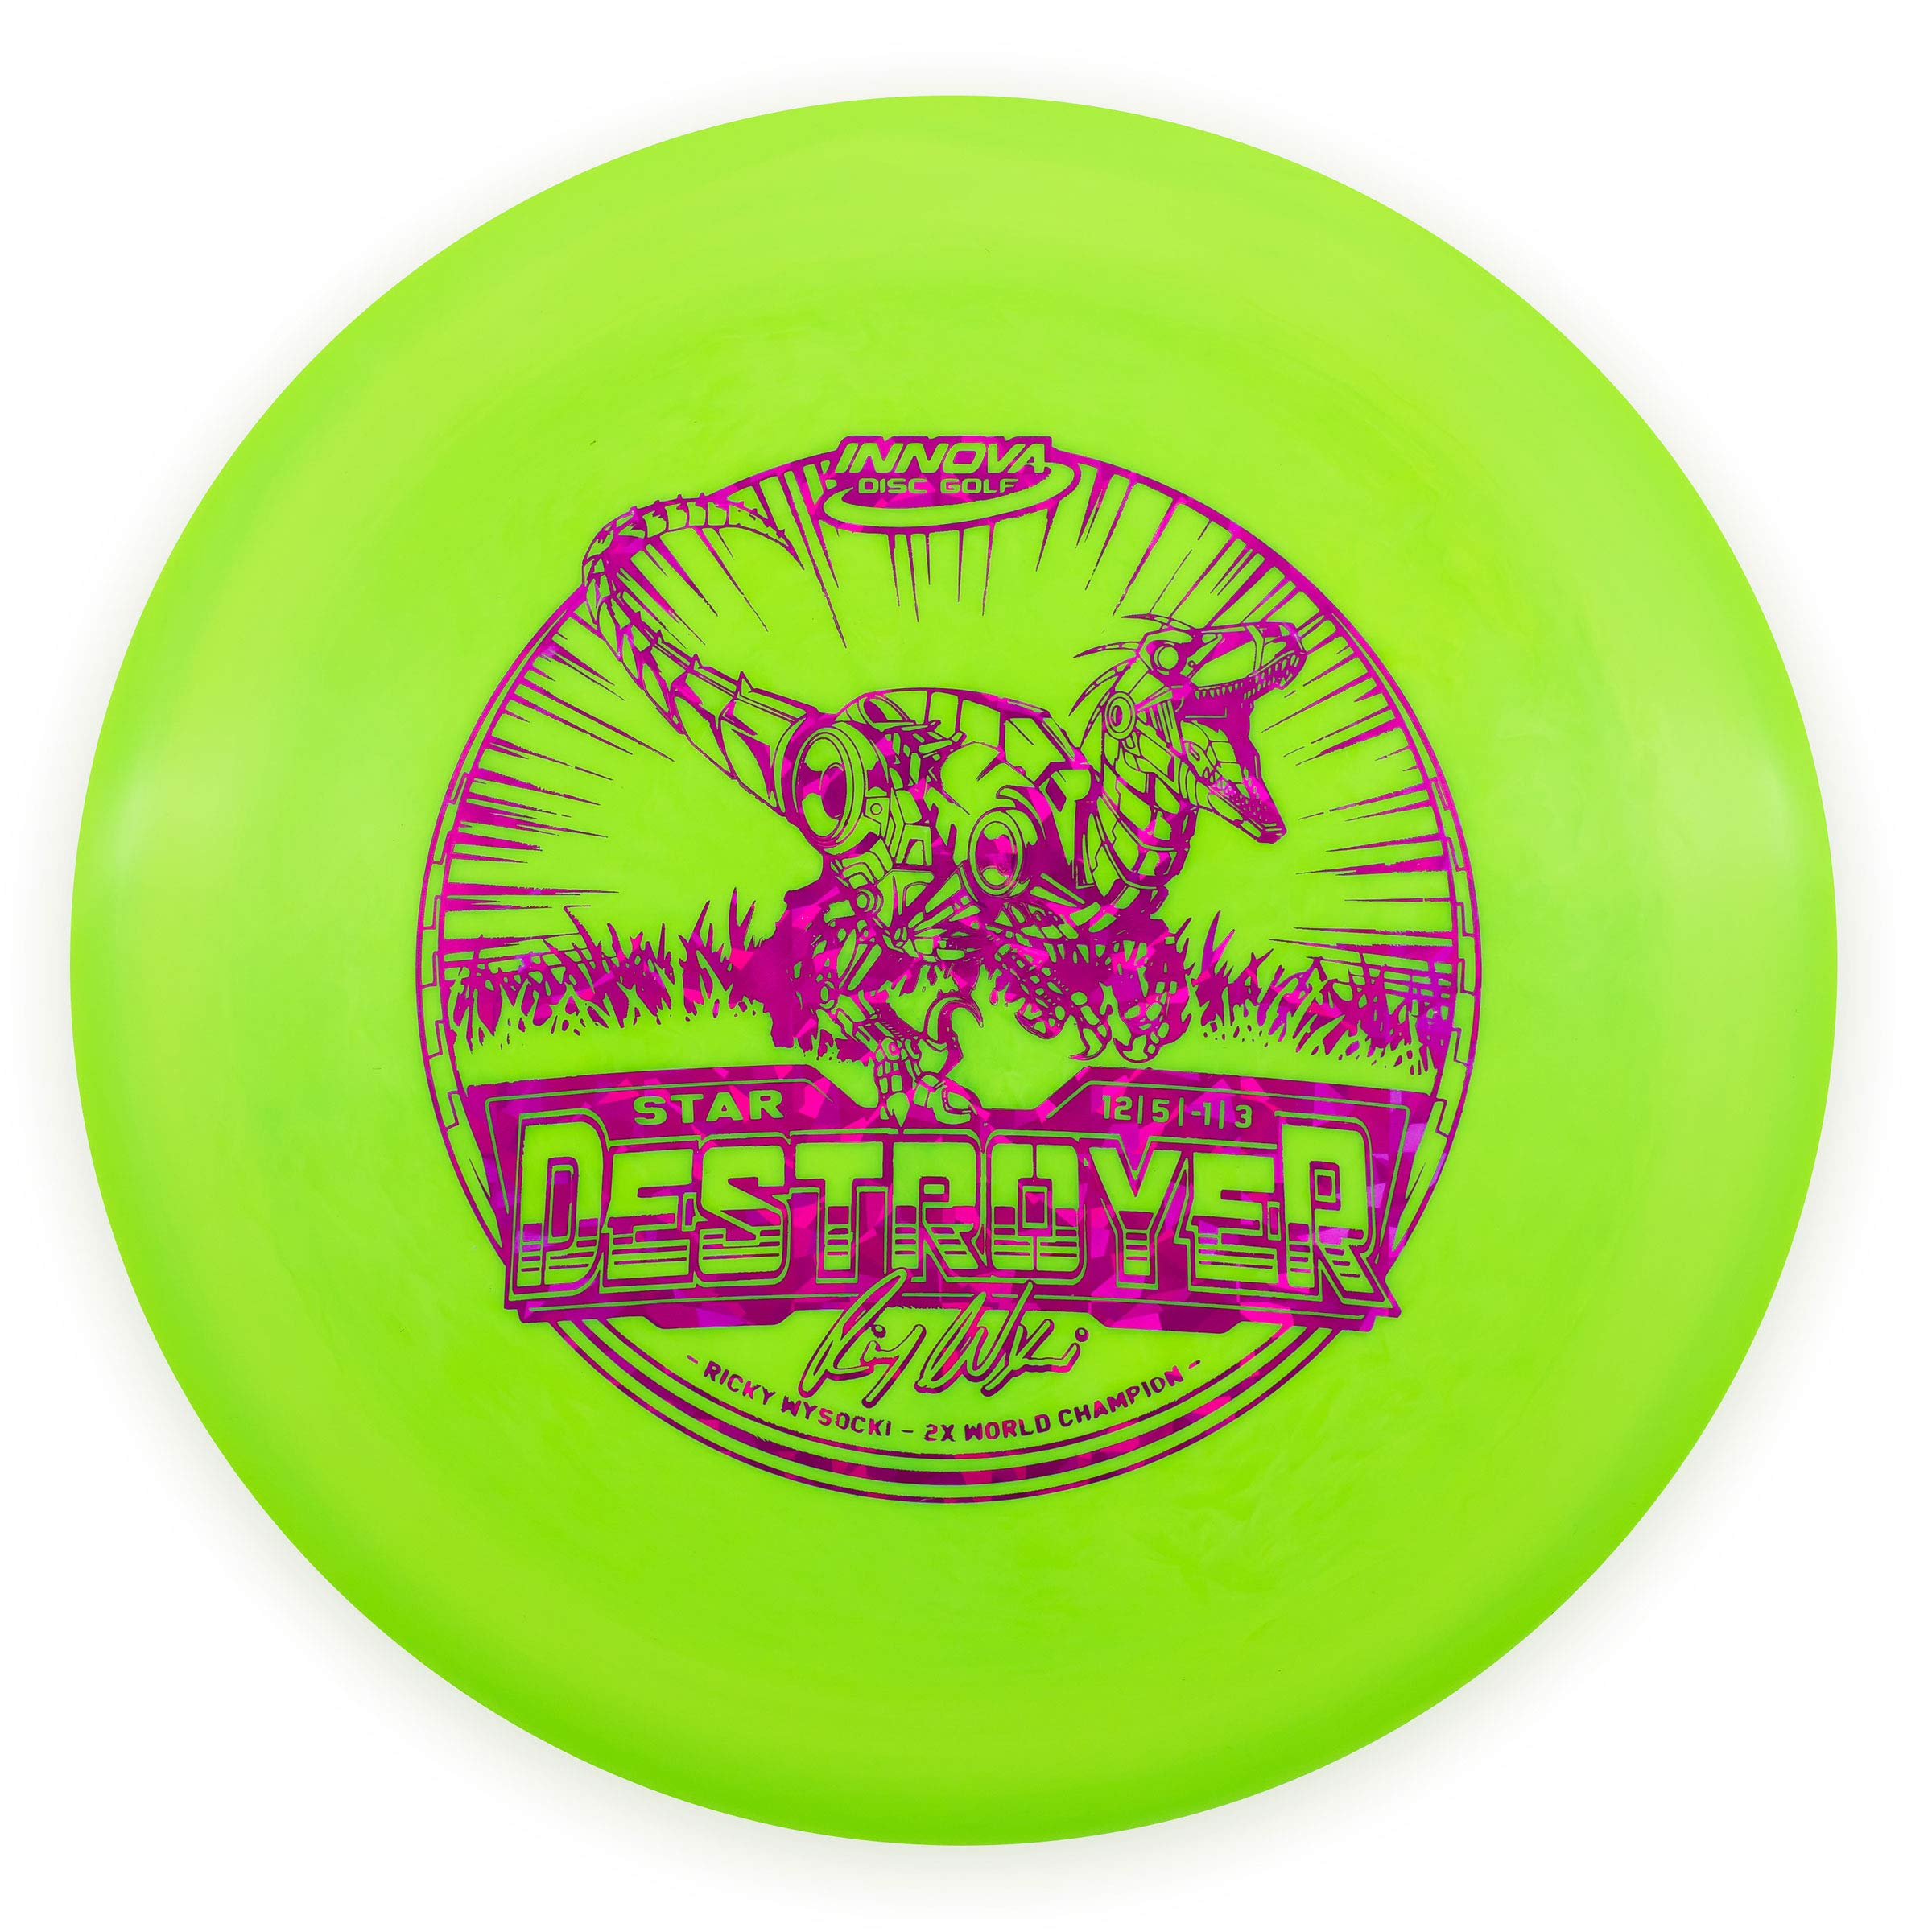 Innova Ricky Wysocki 2X Star Destroyer Distance Driver Golf Disc [Colors May Vary] - 151-159g by Innova Disc Golf